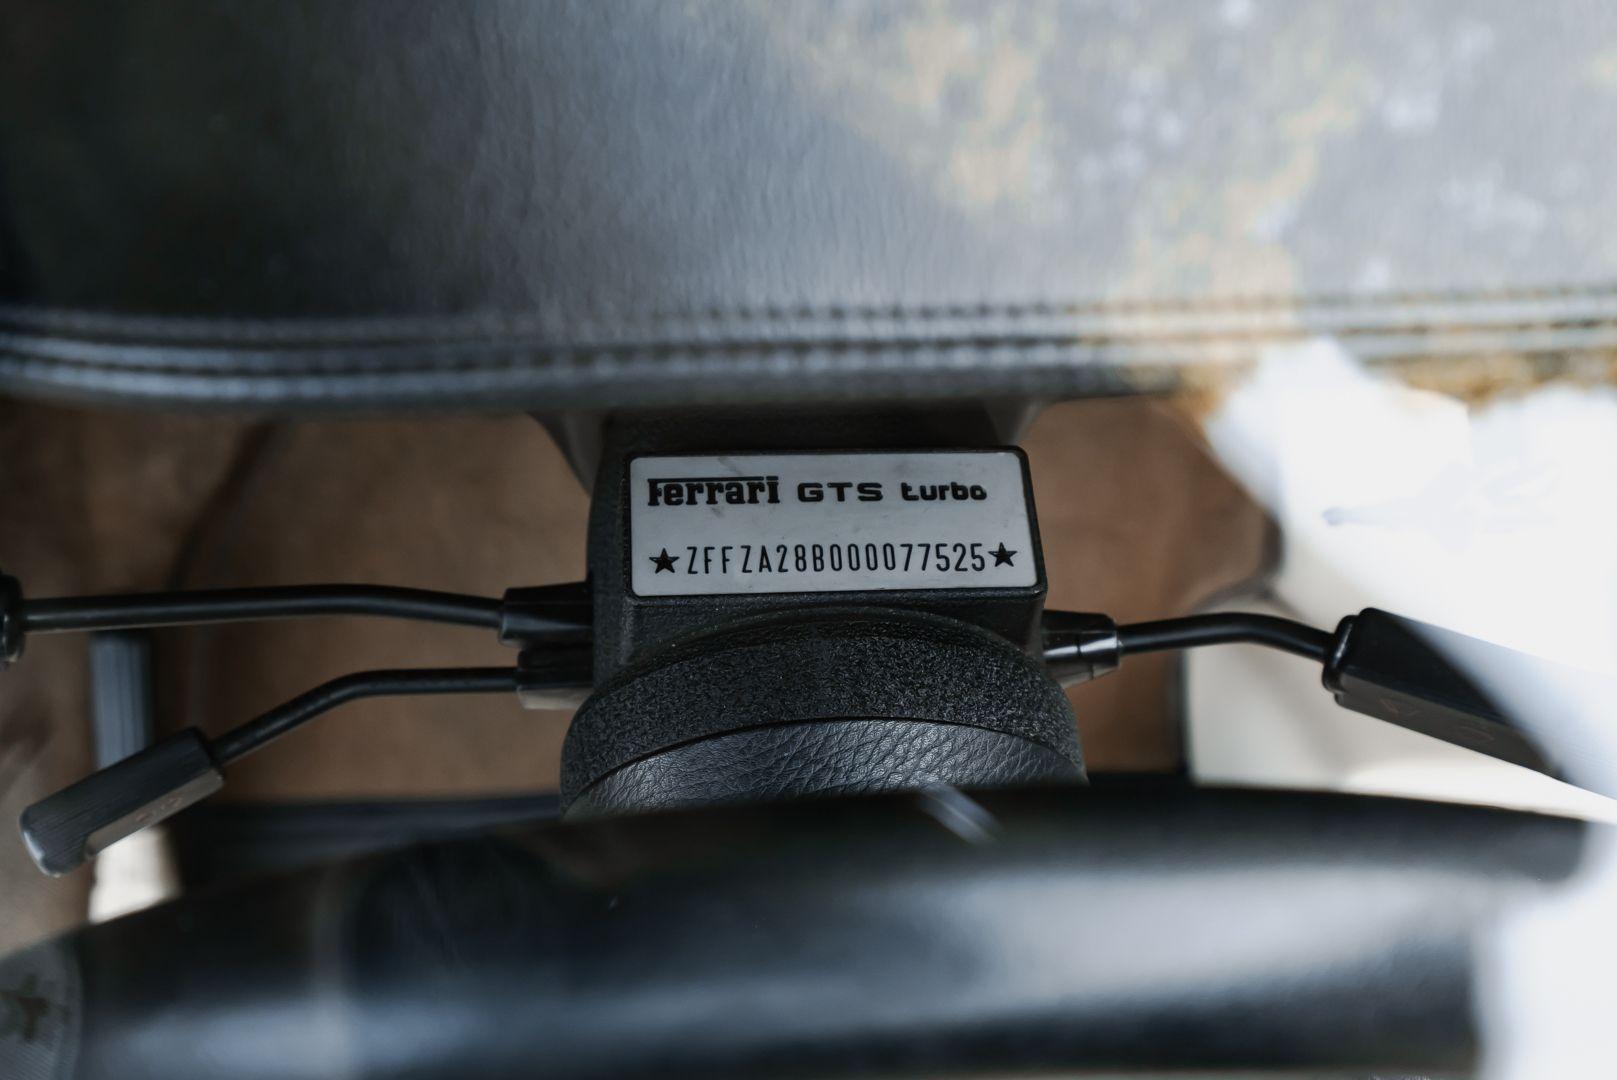 1988 FERRARI 208 GTS TURBO INTERCOOLER 75392